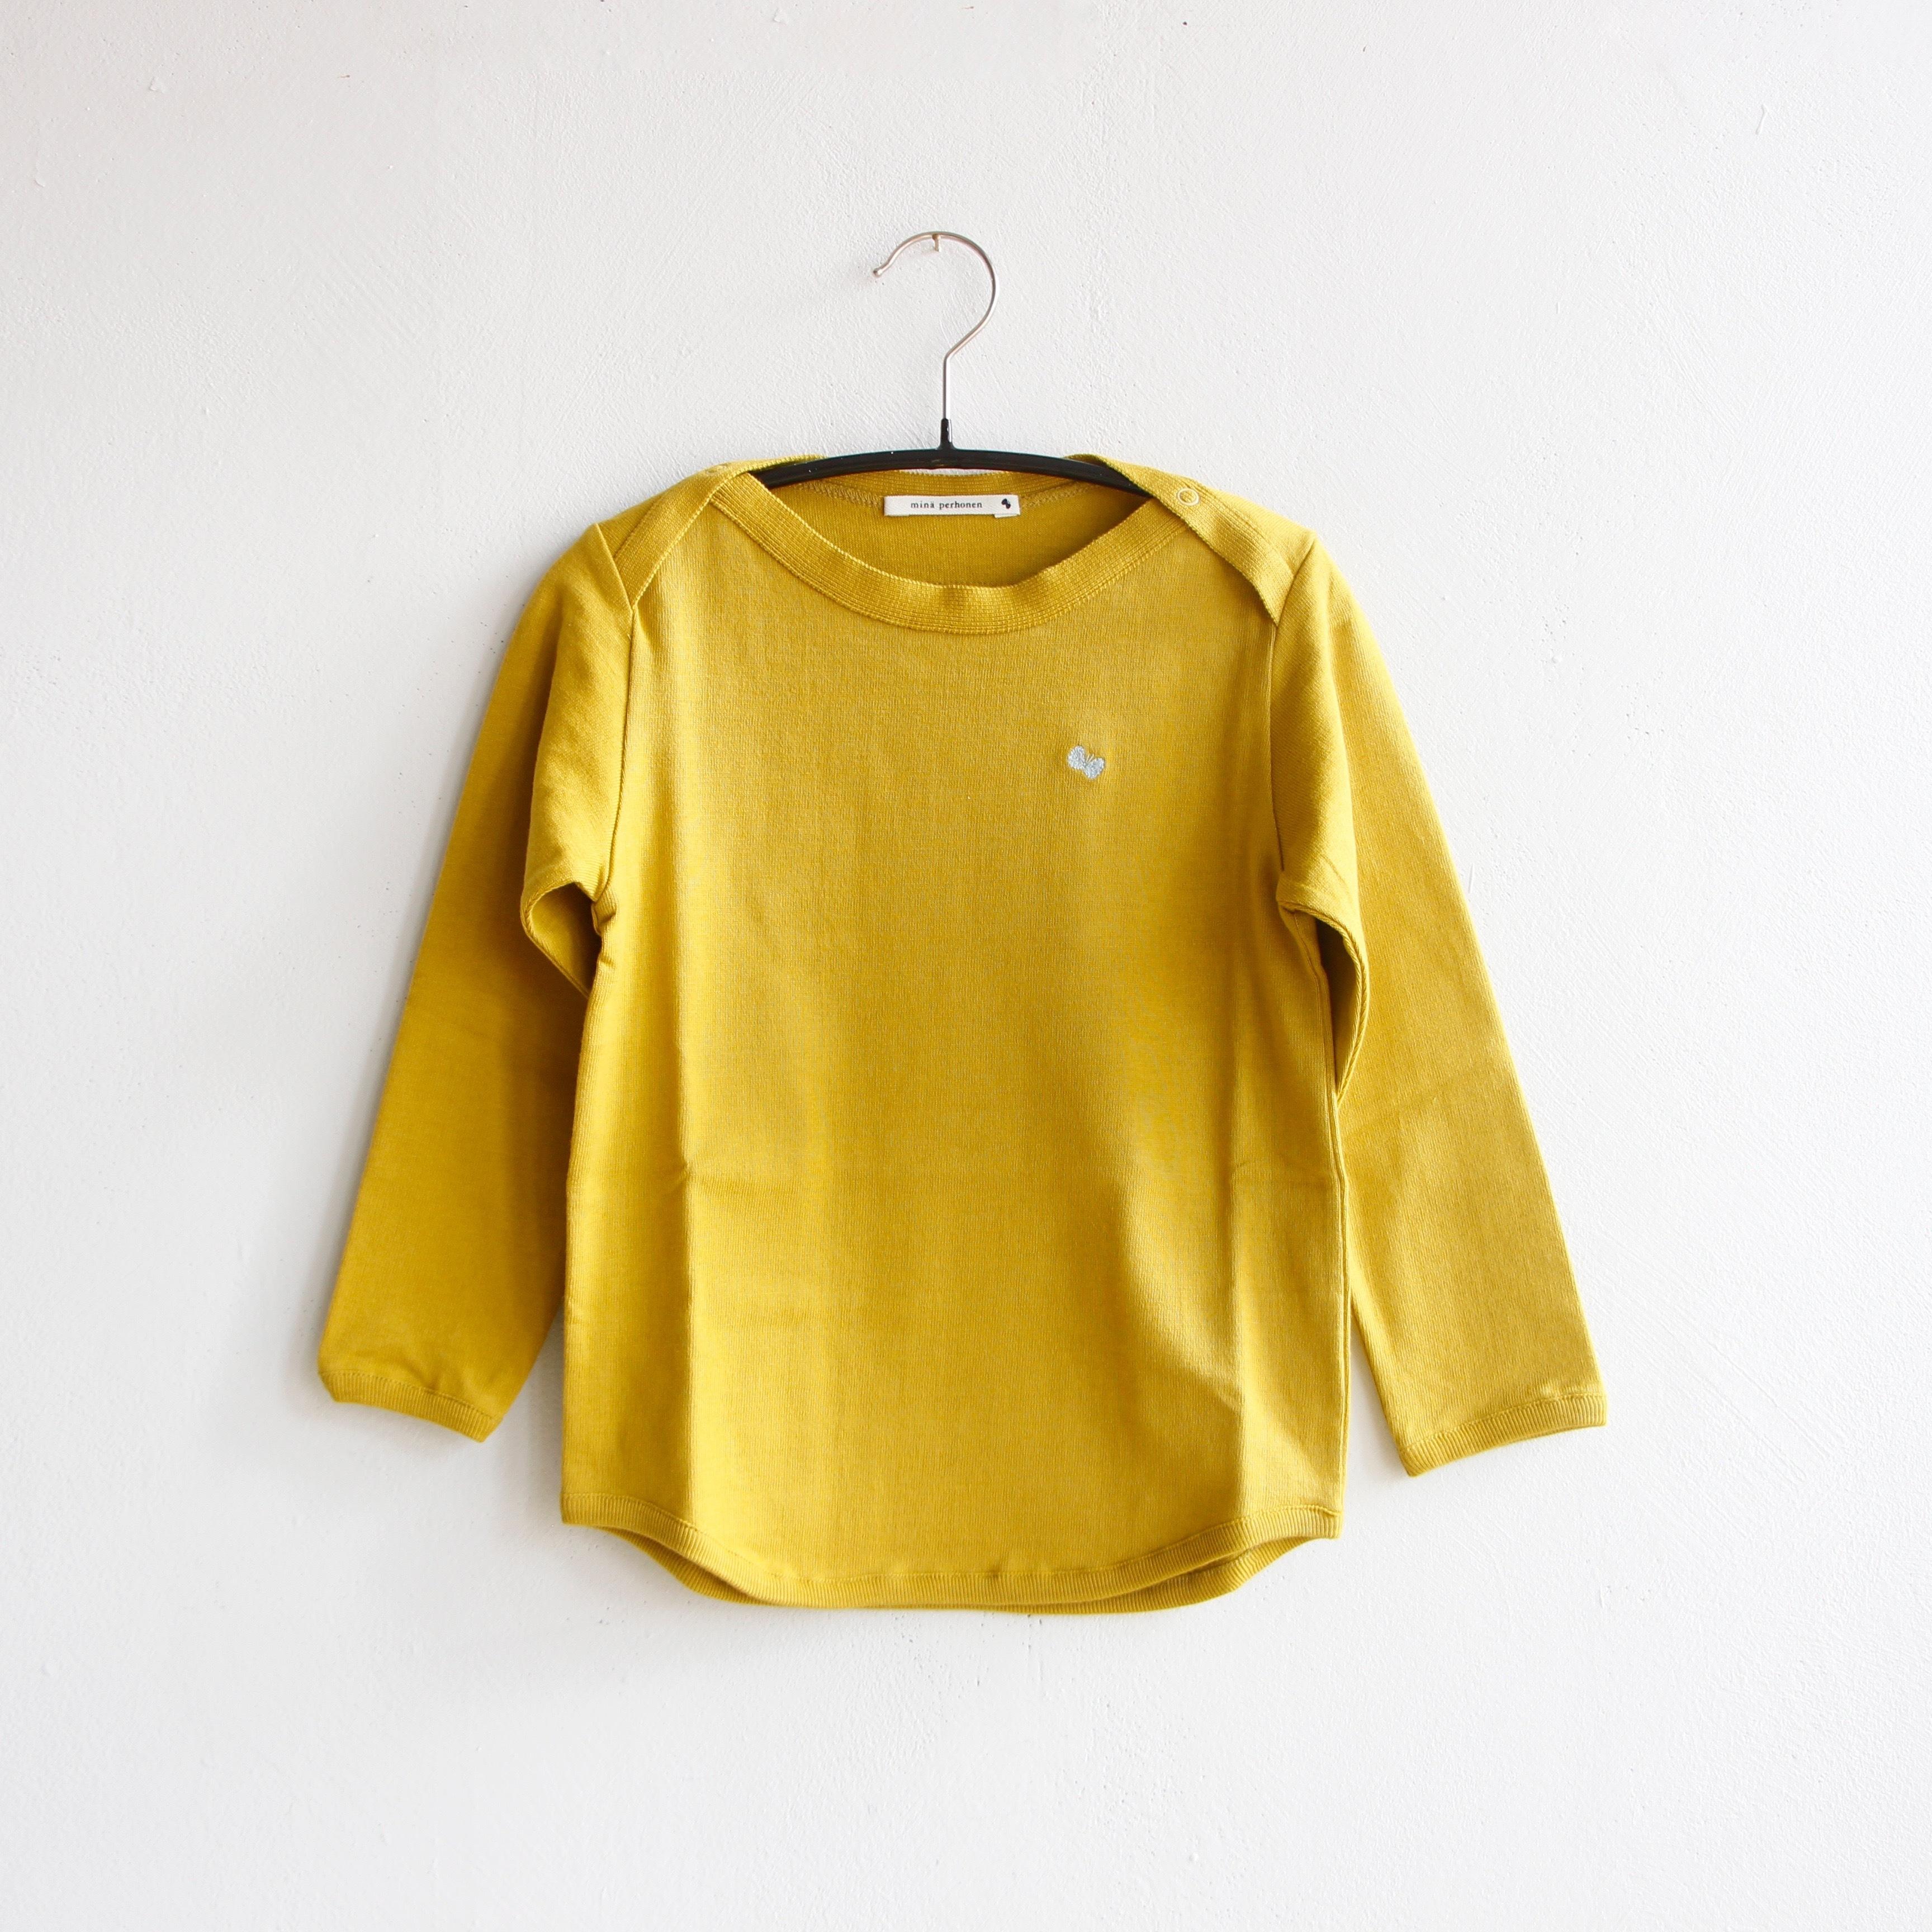 《mina perhonen 2020AW》zutto 長袖カットソー / mustard / 110cm